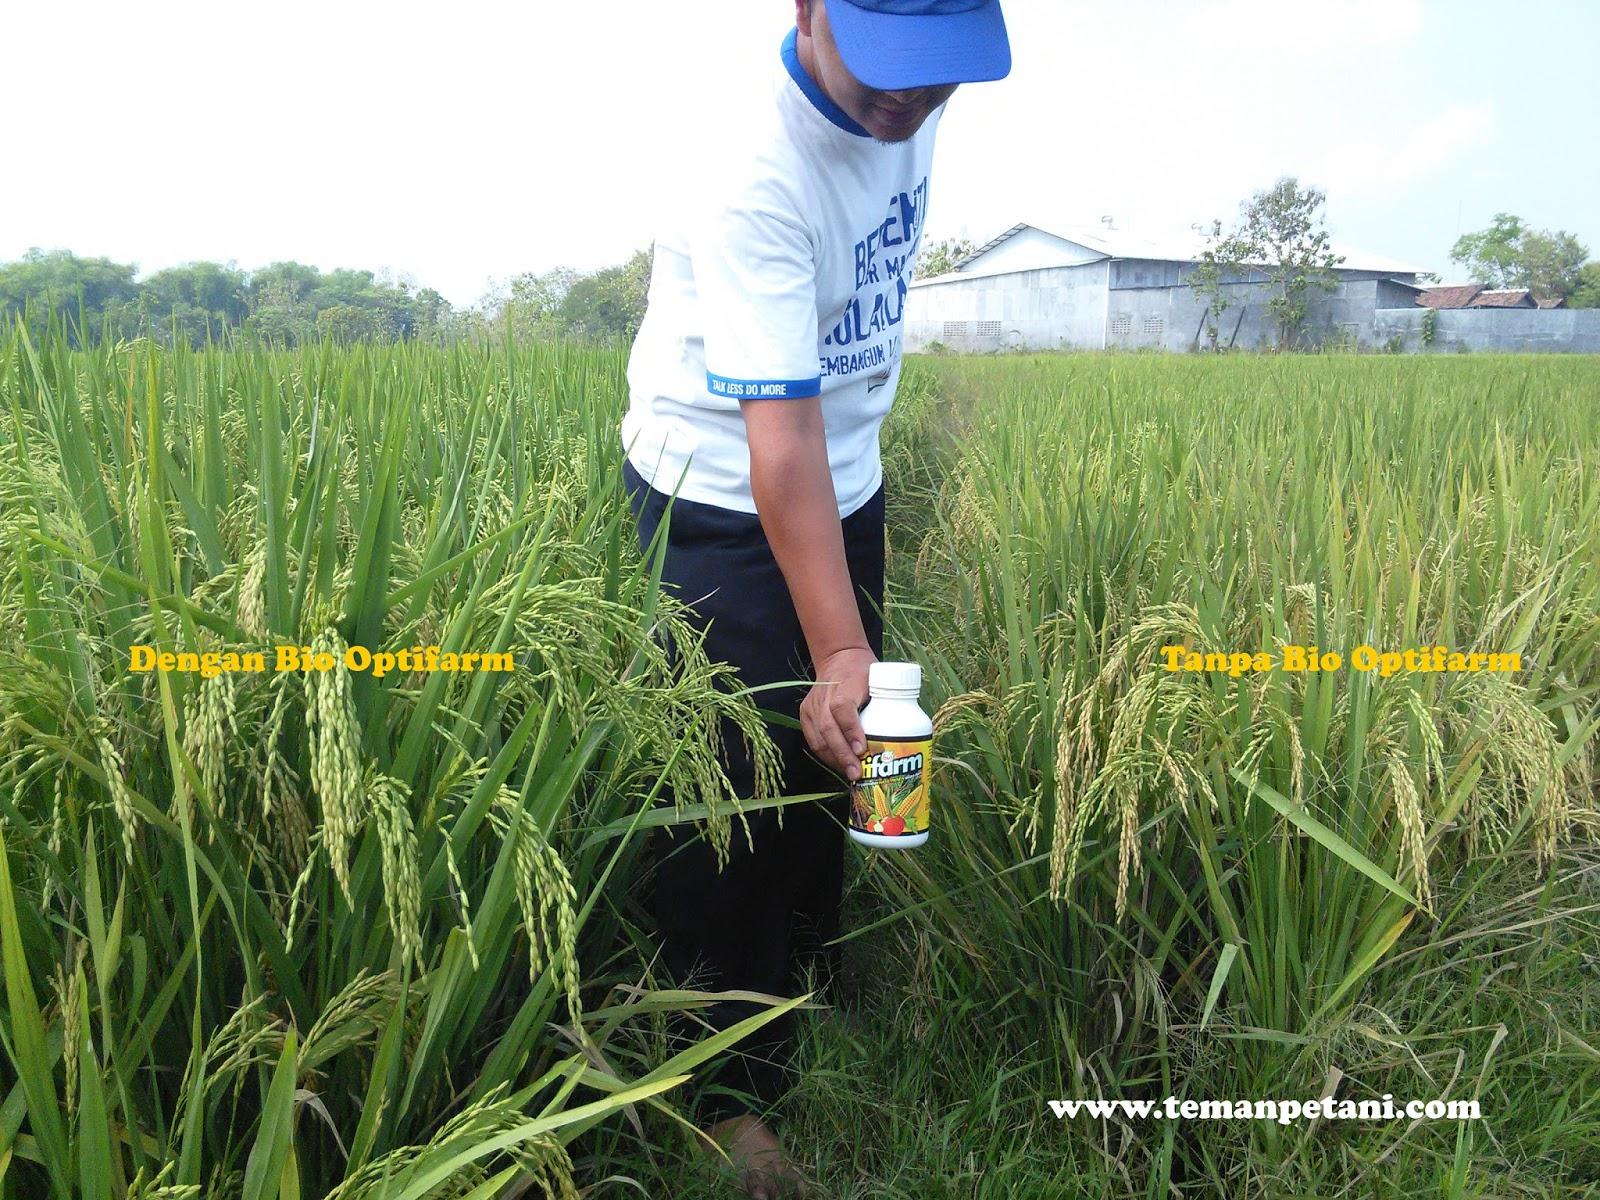 Panen padi dengan Bio Optifarm meningkat, tanaman sembuh dari penyakit kresek